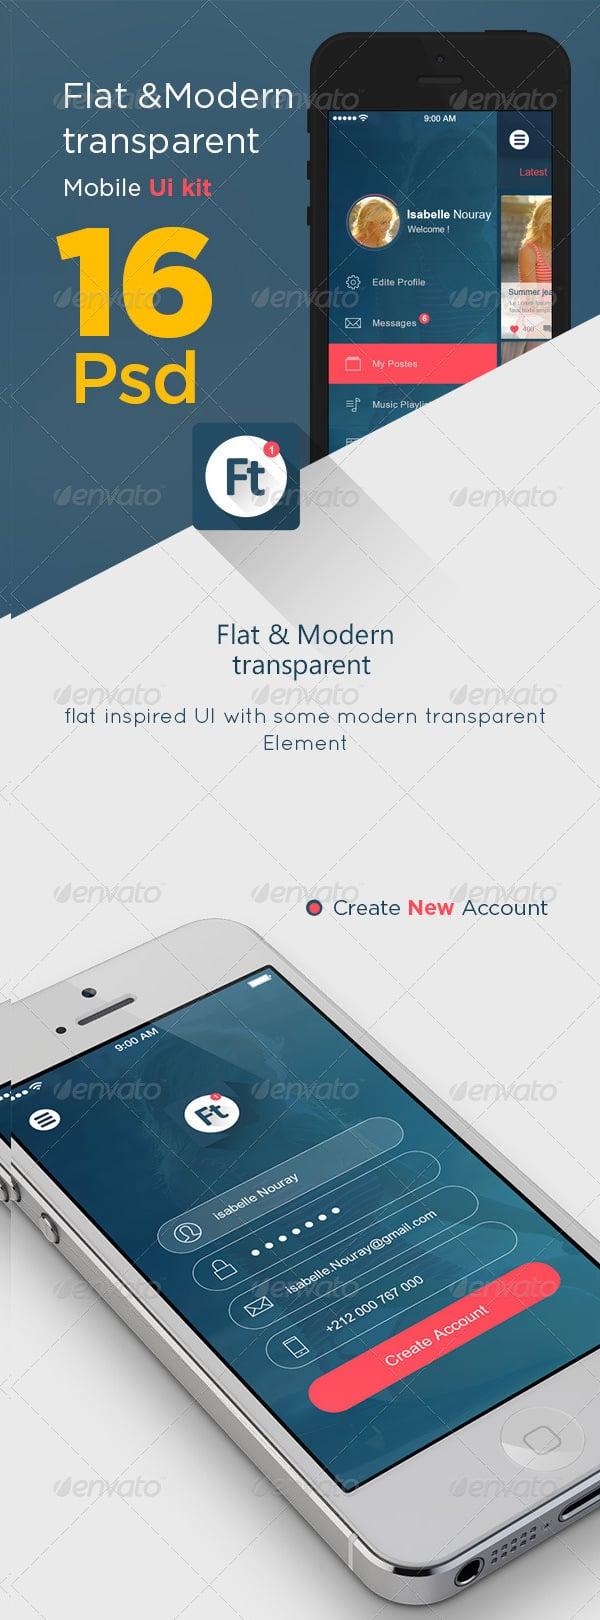 transparent app ui kit